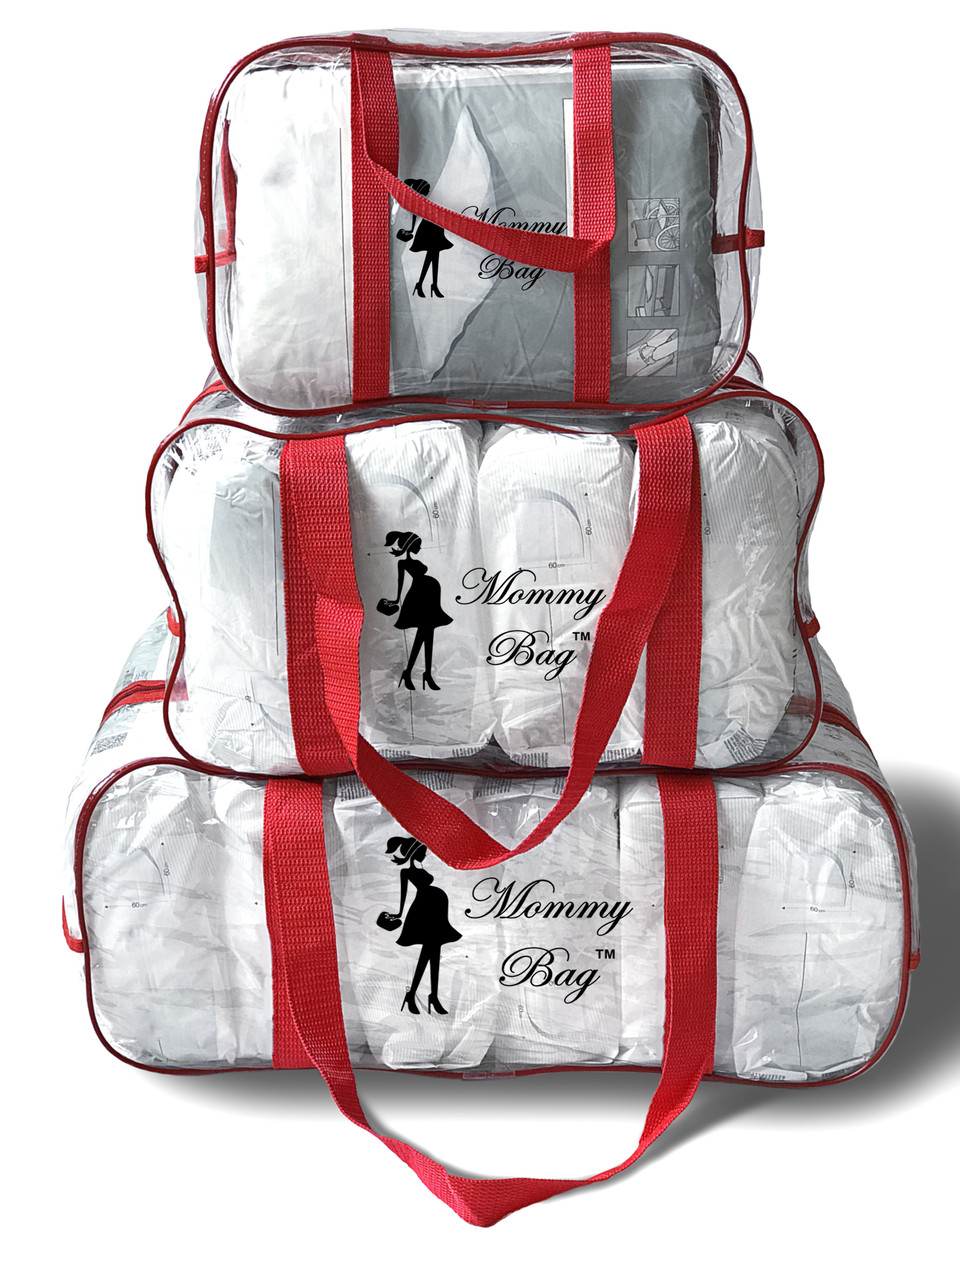 cf65f20a8681 Набор из 3 прозрачных сумок в роддом Mommy Bag сумка - S,M,L ...